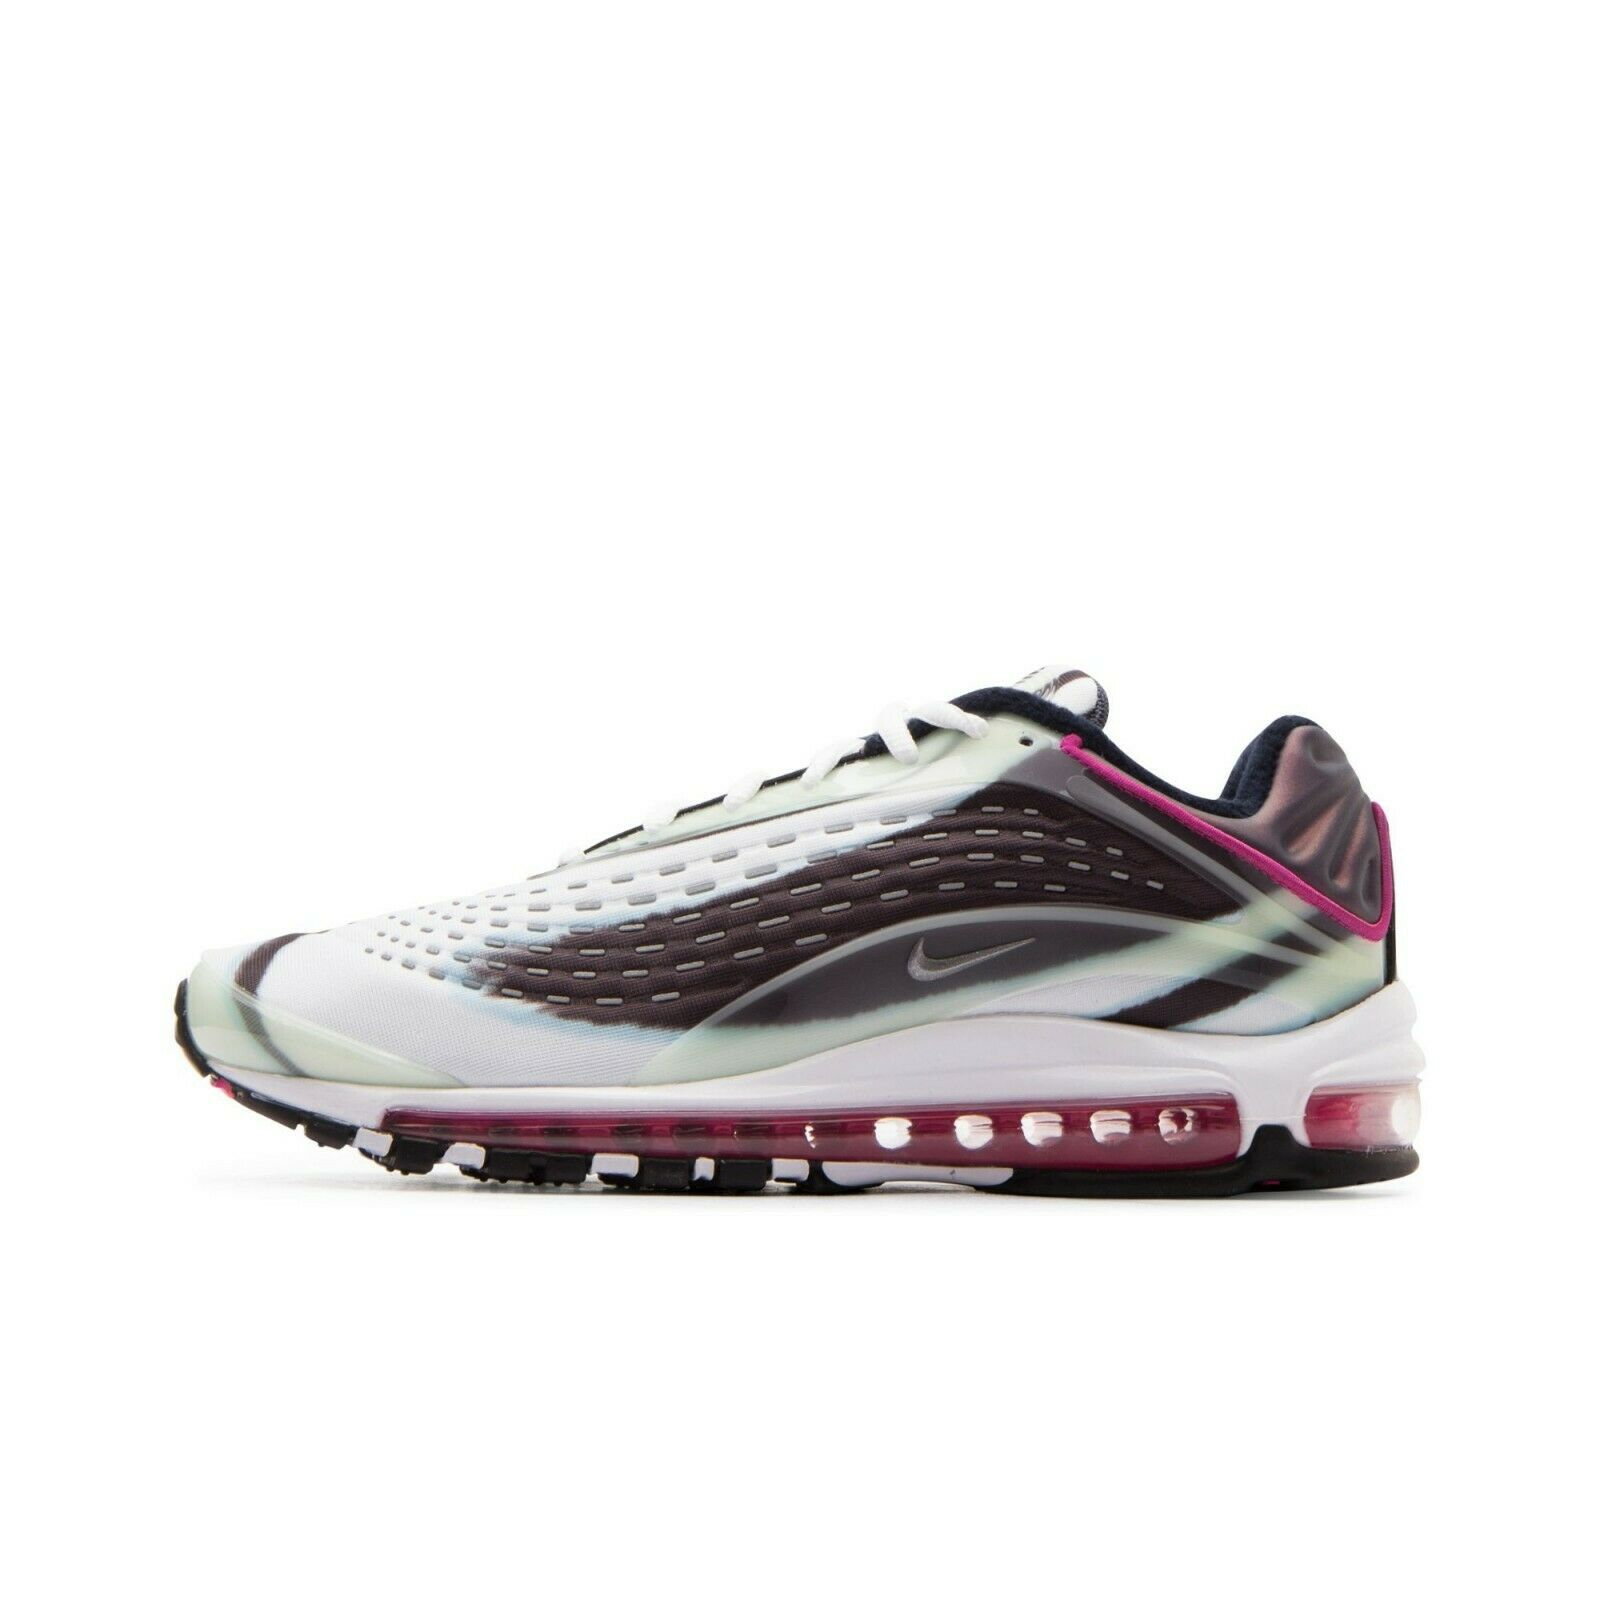 Herren Nike Air Max Deluxe Turnschuhe Grün AJ7831 301 Exklusiv